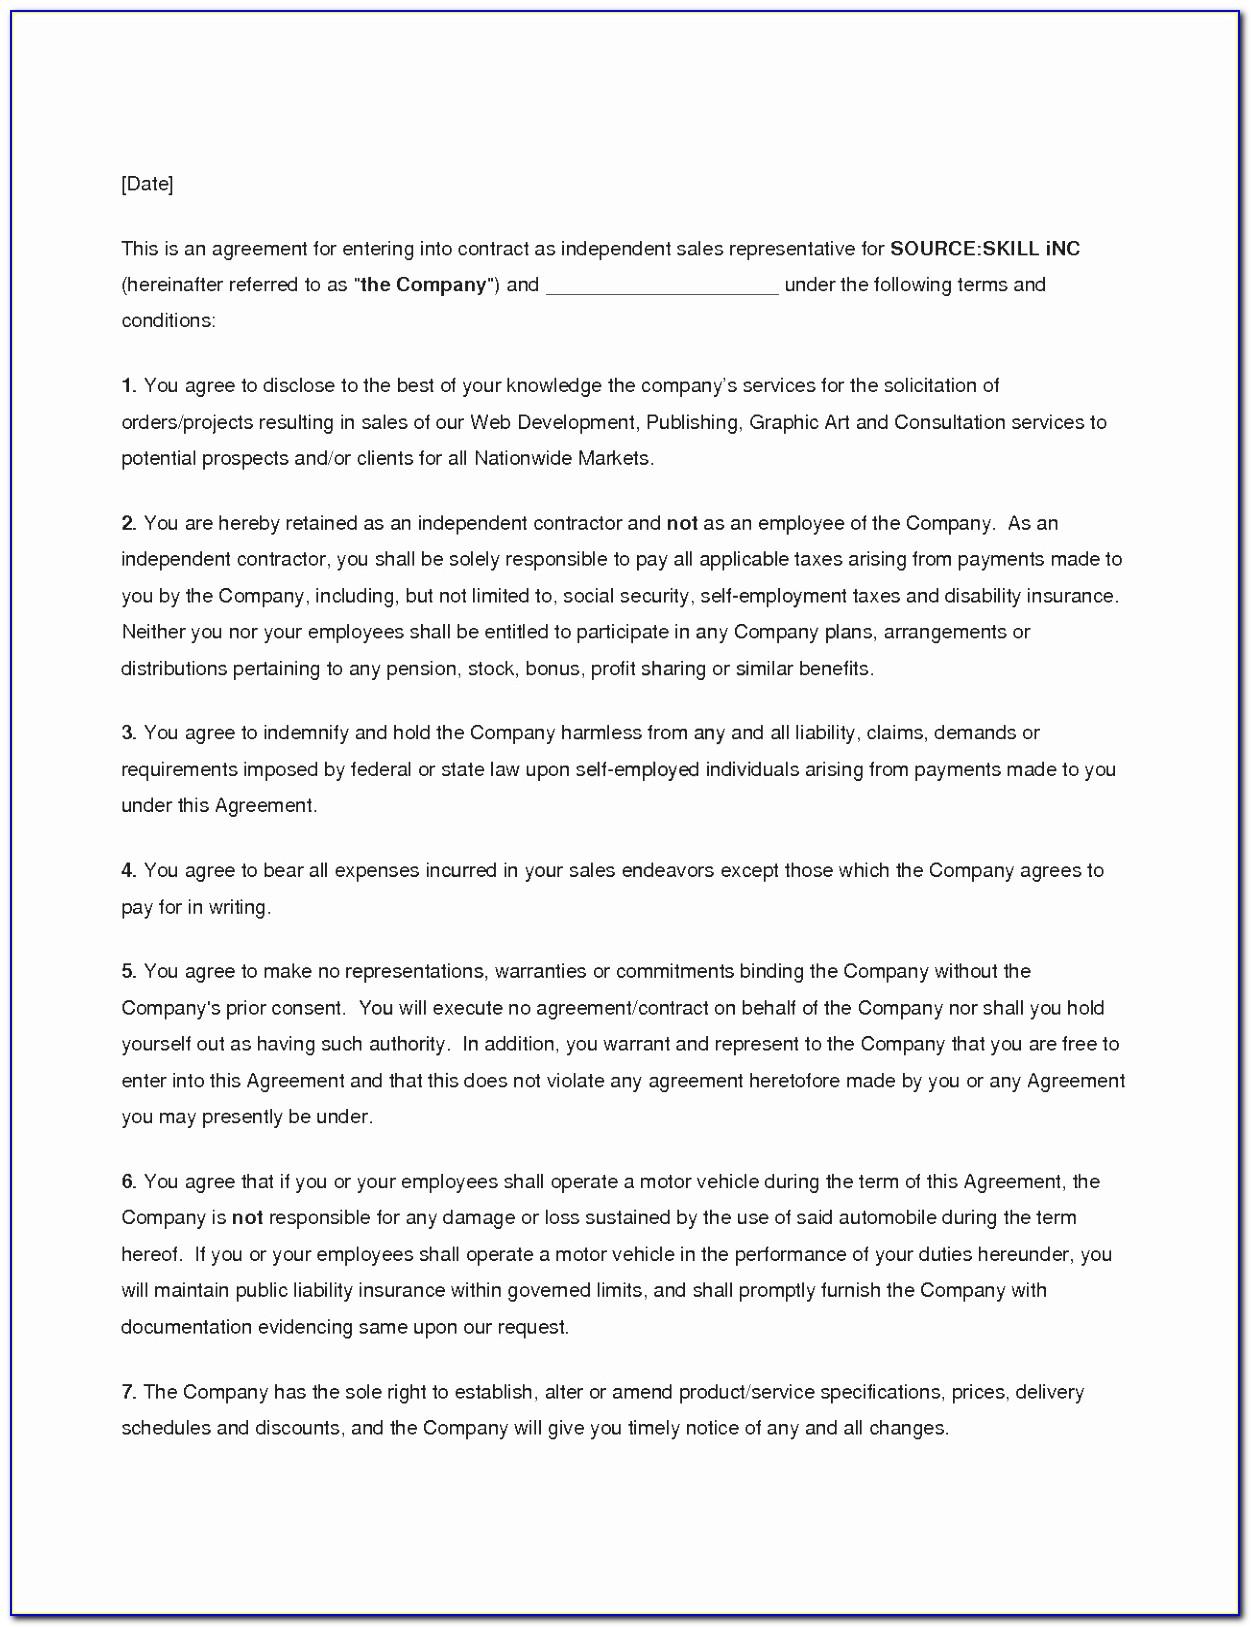 Manufacturer Representative Agreement Template